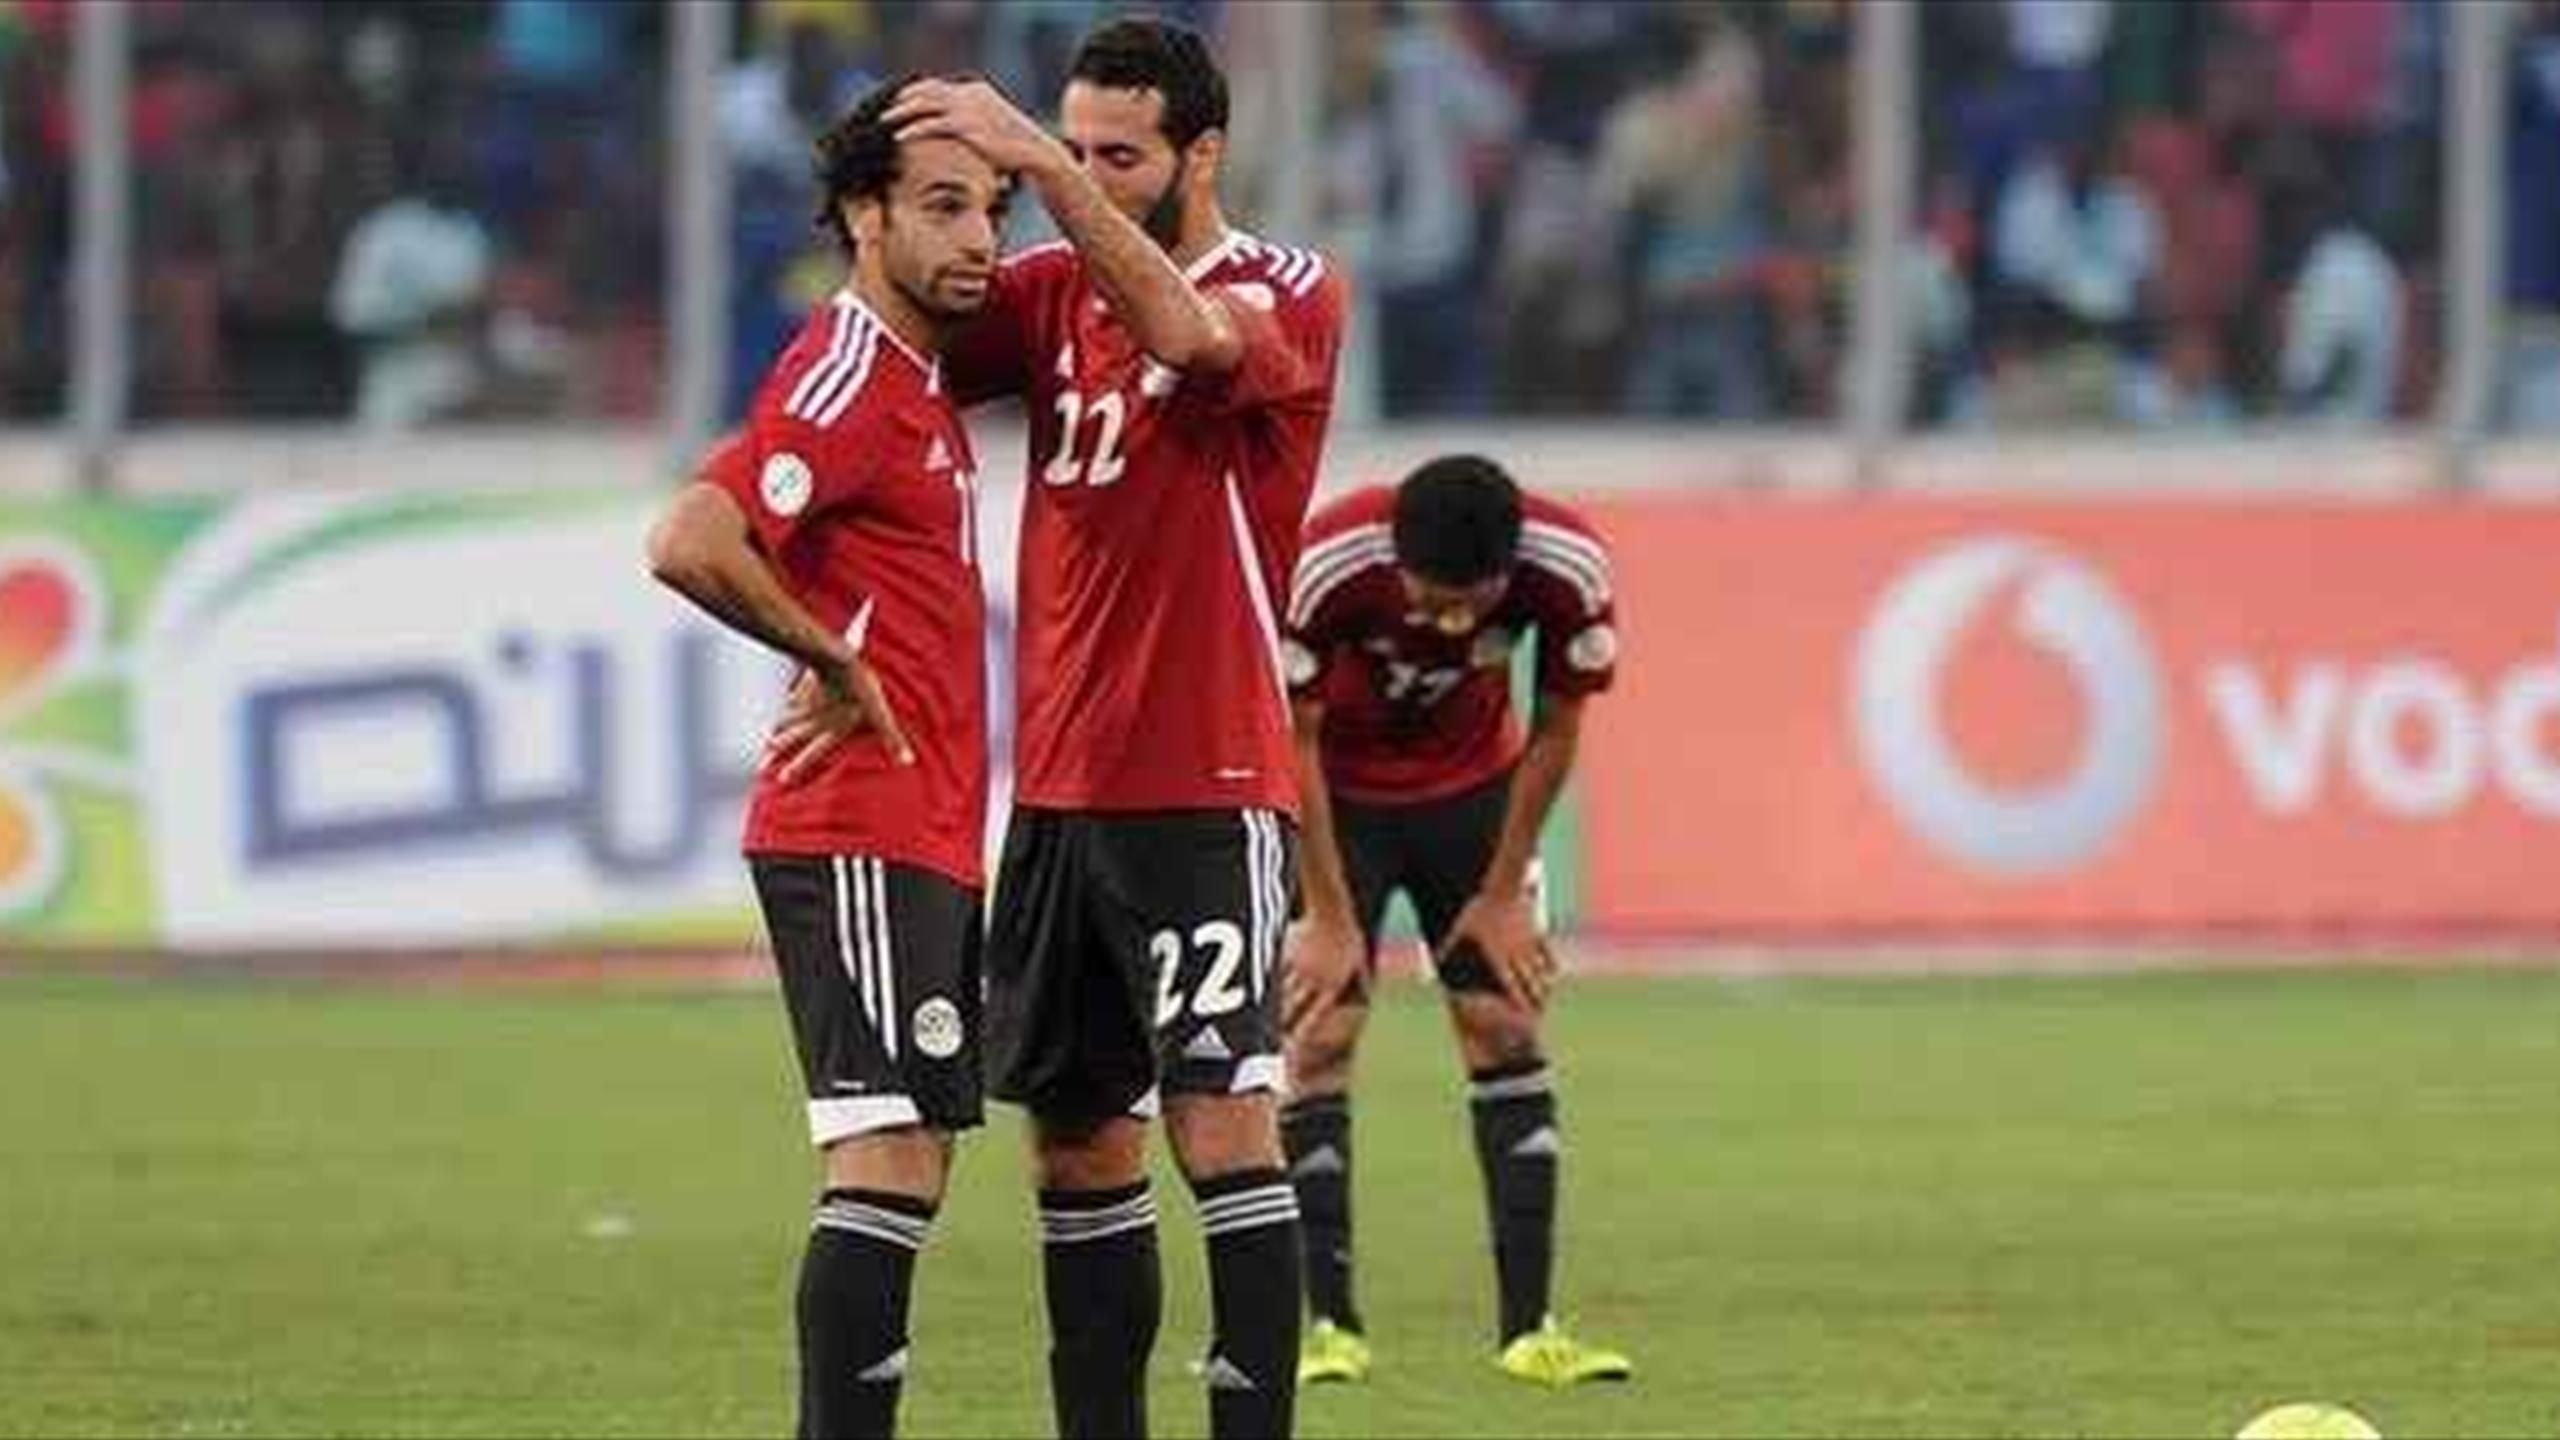 Image result for مصر غانا 6-1 تريكة وصلاح